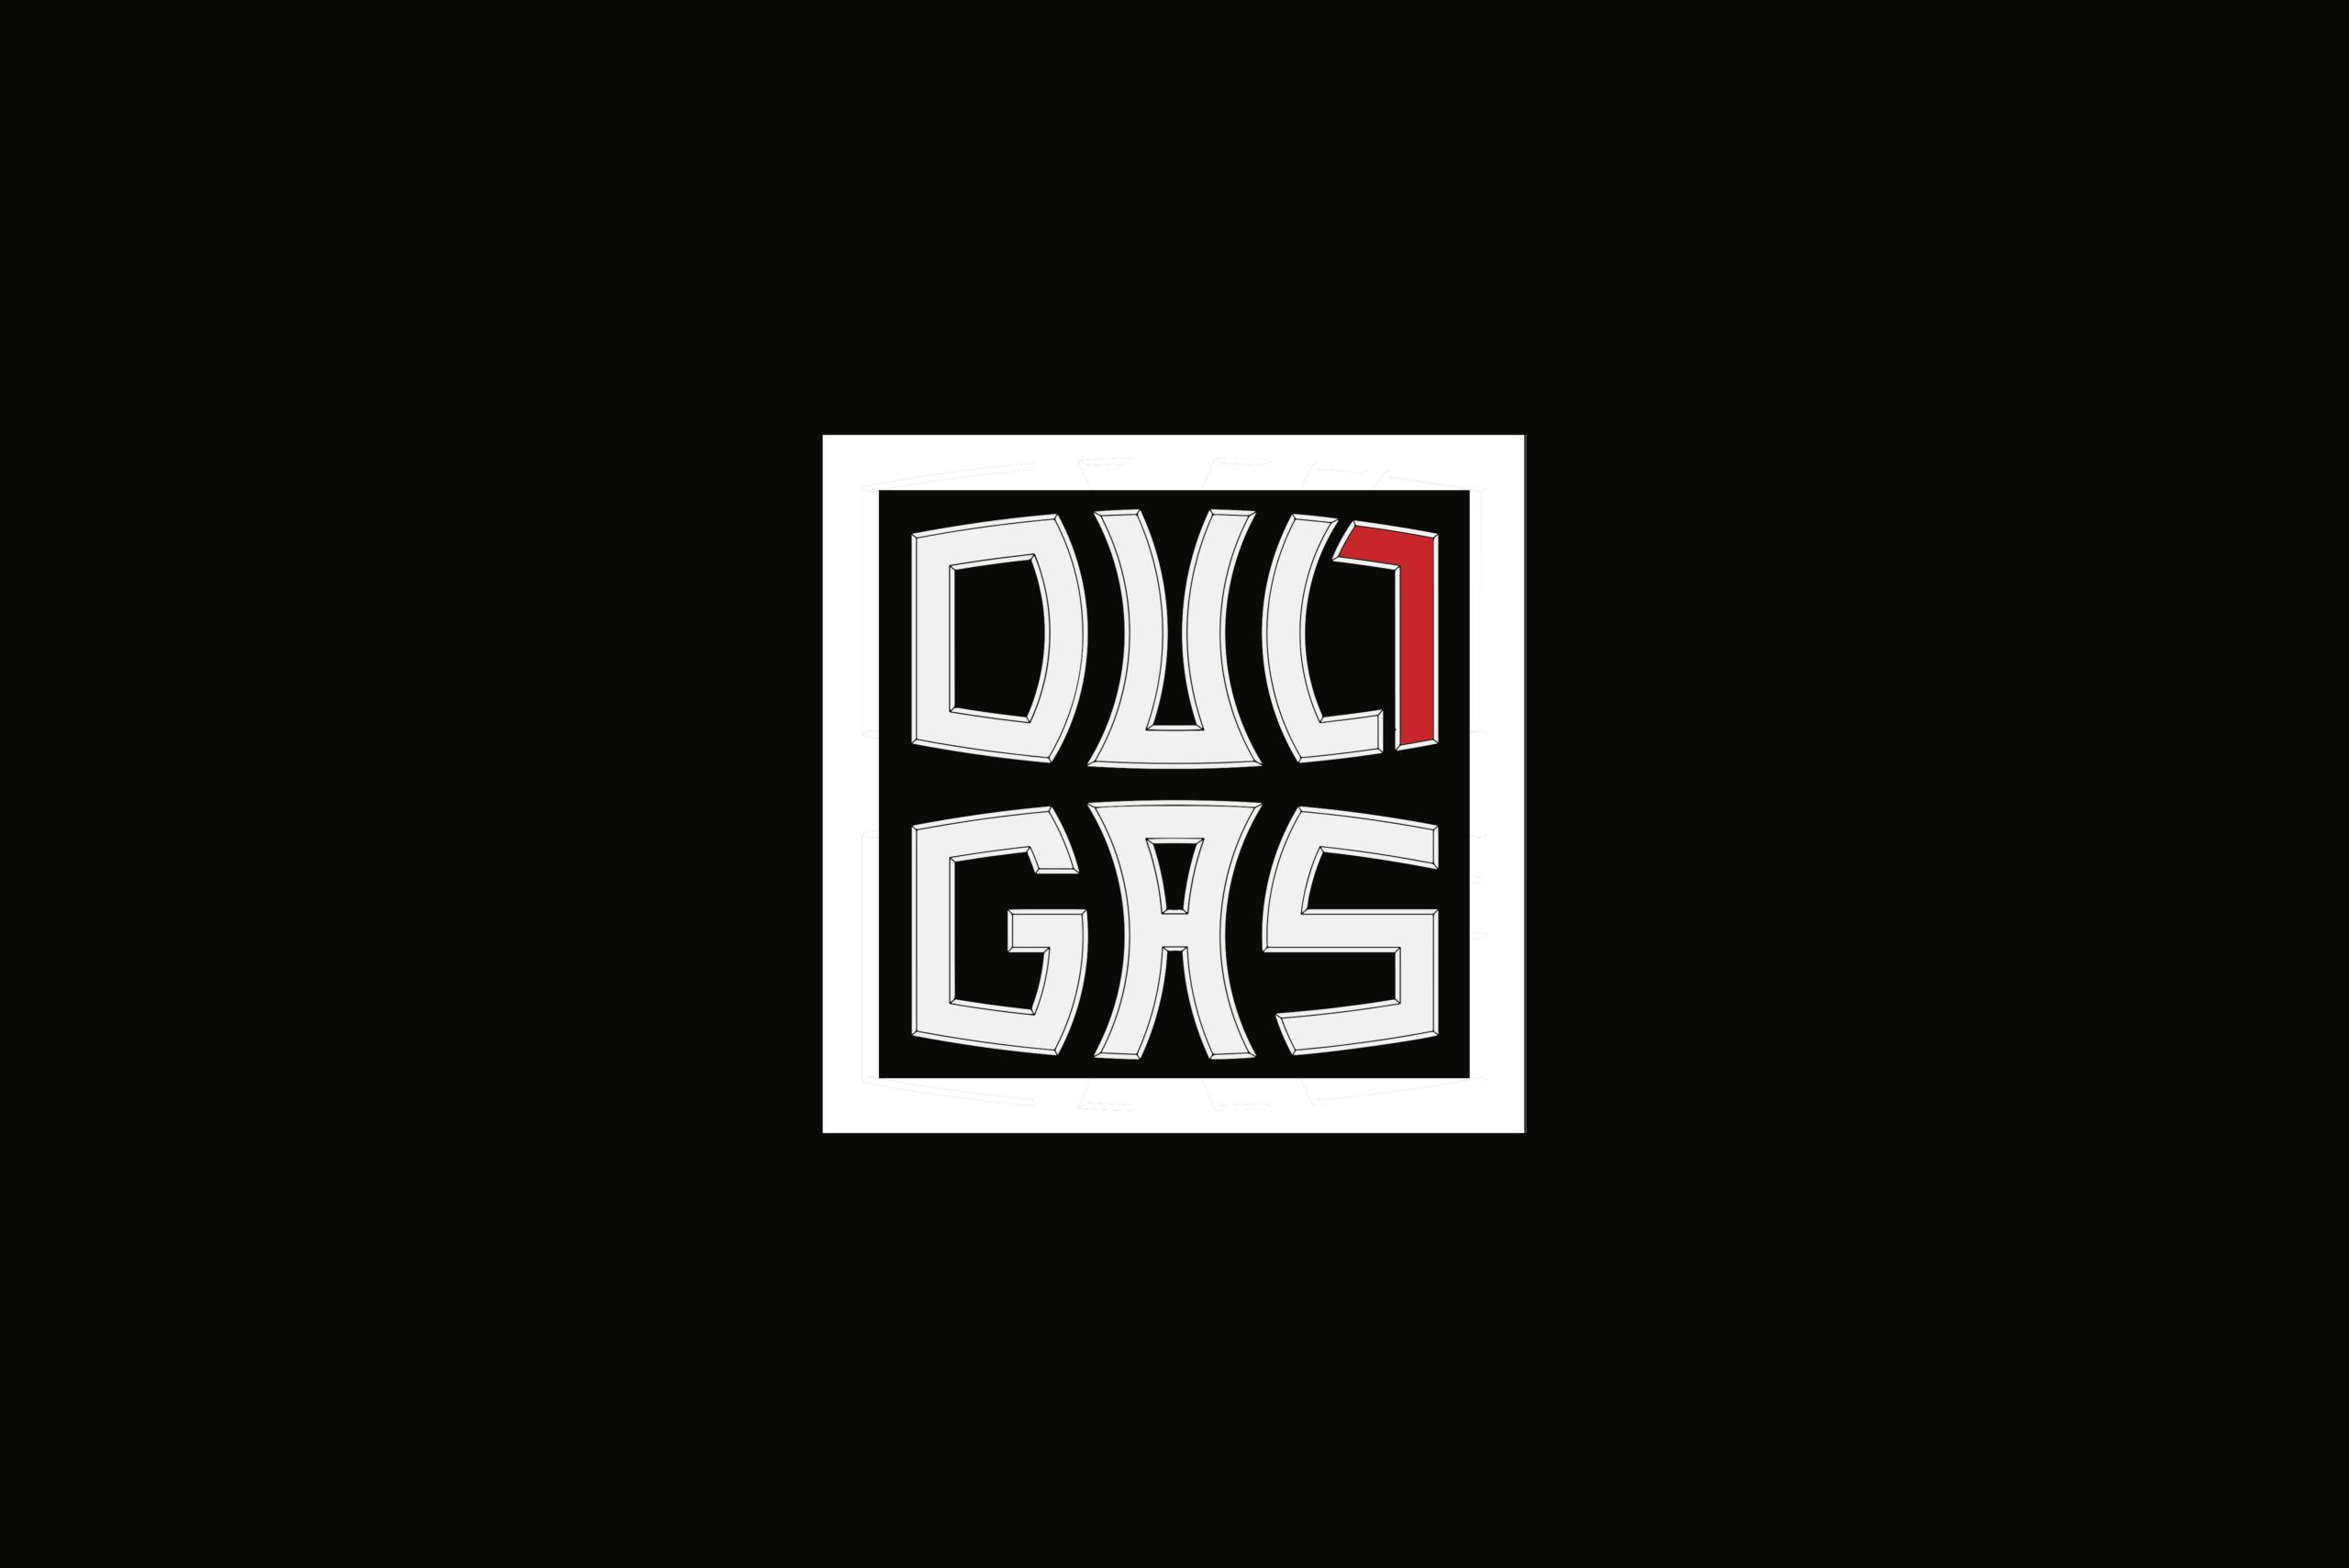 dull gas logo